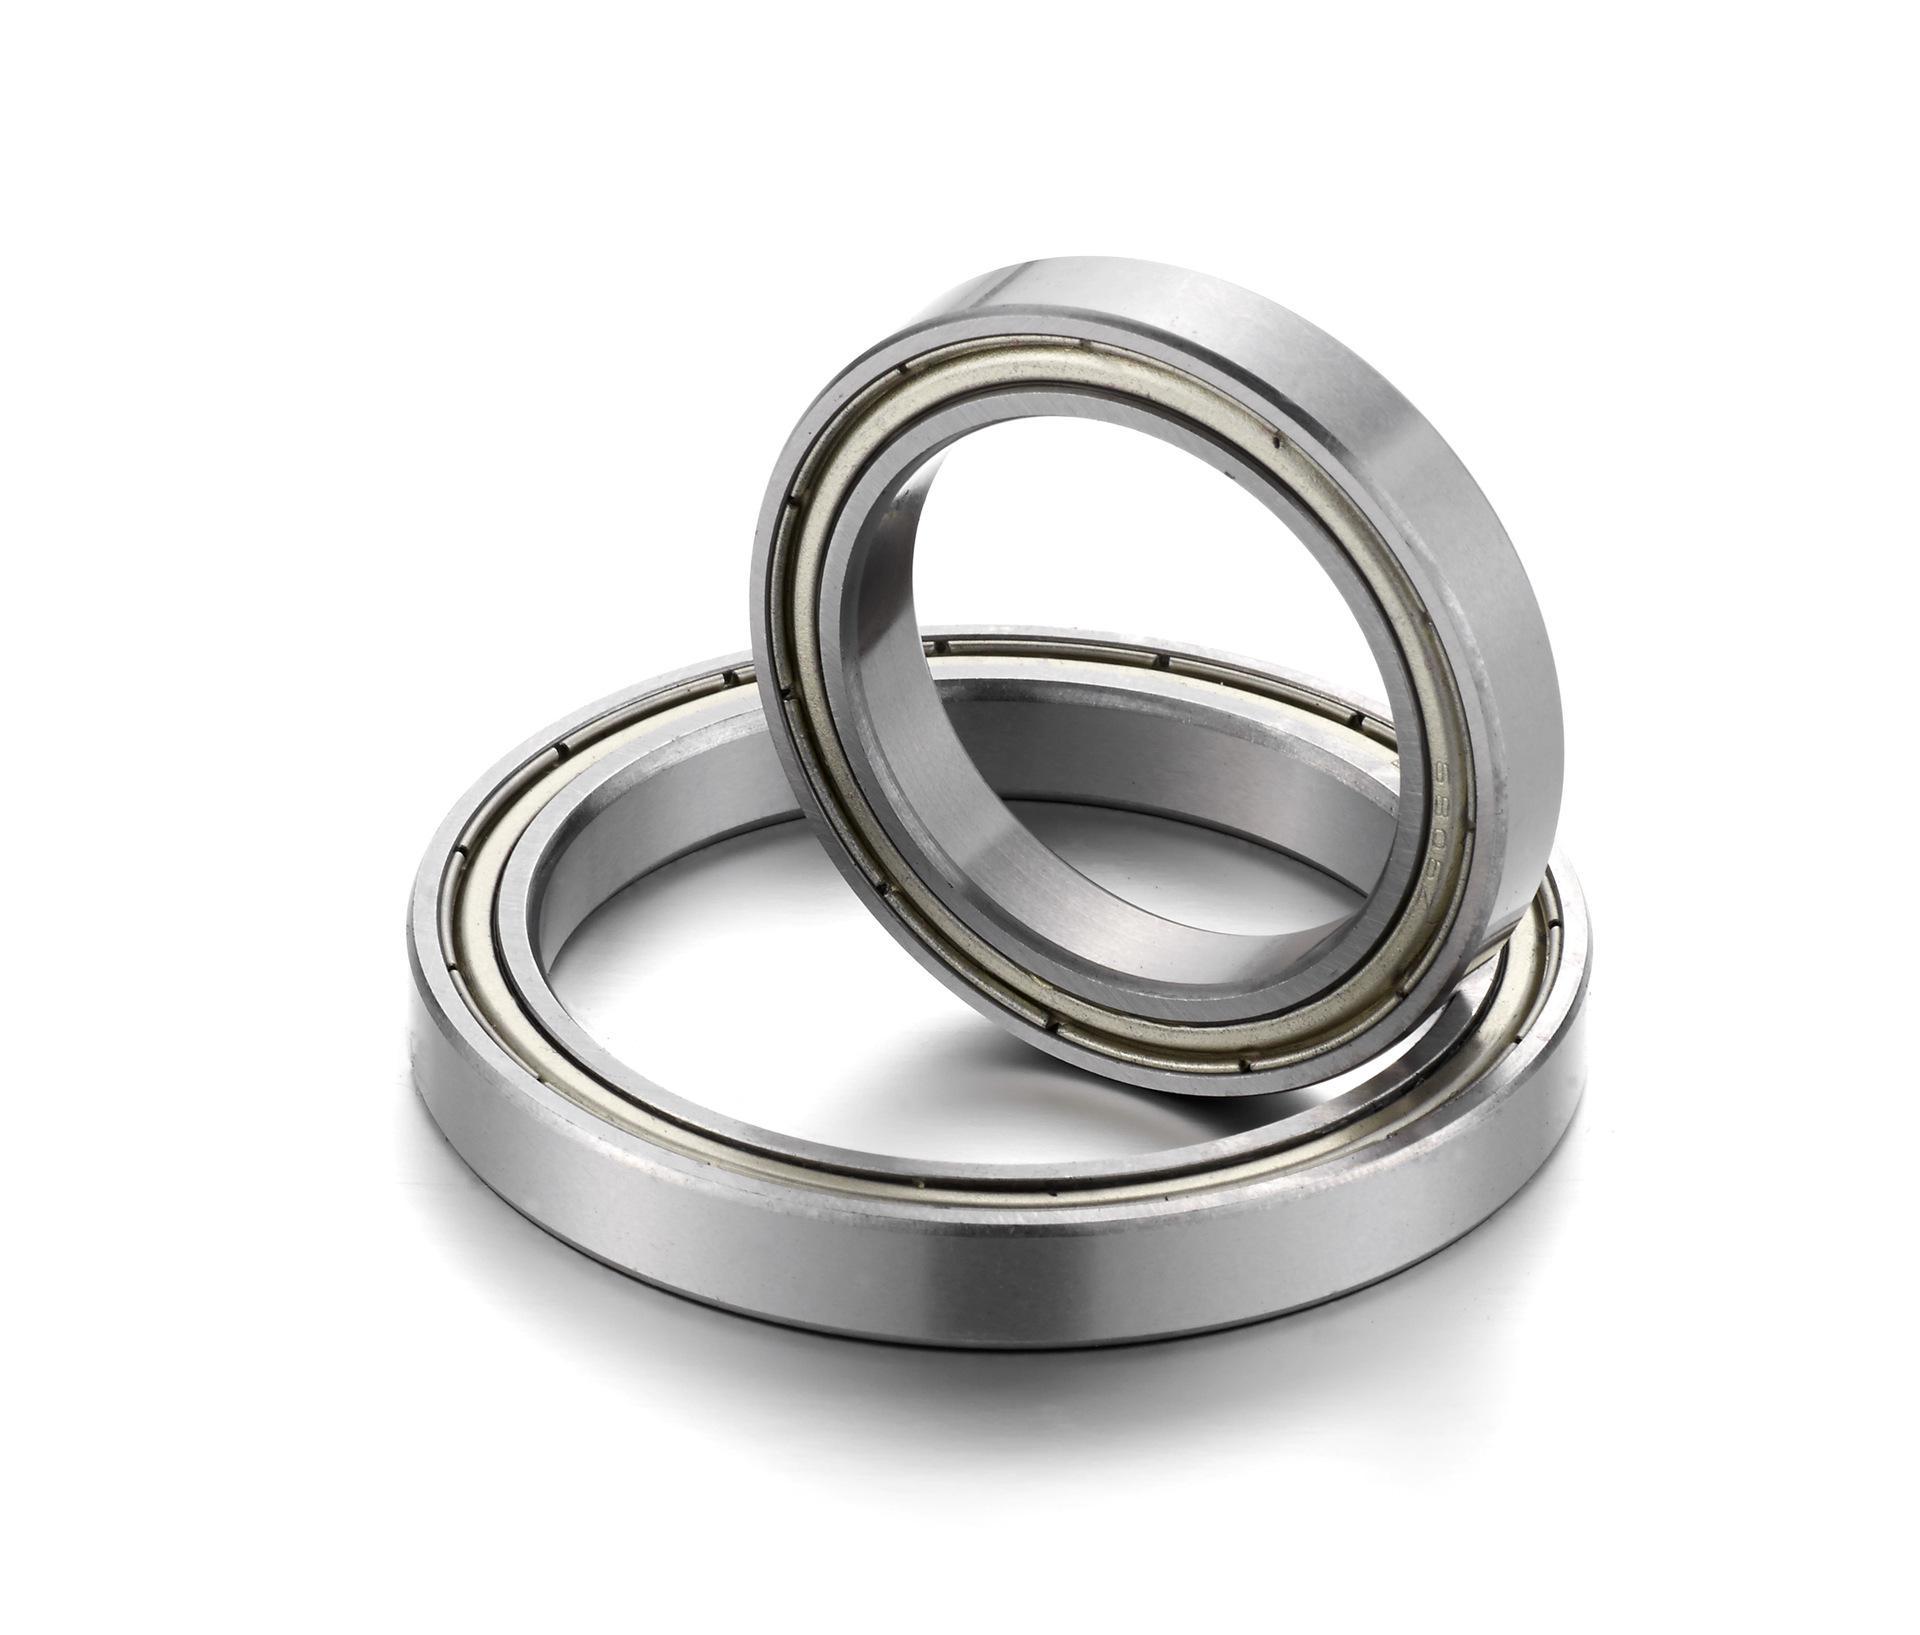 6830M ABEC-1 150x190x20mm Metric Thin Section Bearings 61830M Brass cage 1pcs 71901 71901cd p4 7901 12x24x6 mochu thin walled miniature angular contact bearings speed spindle bearings cnc abec 7